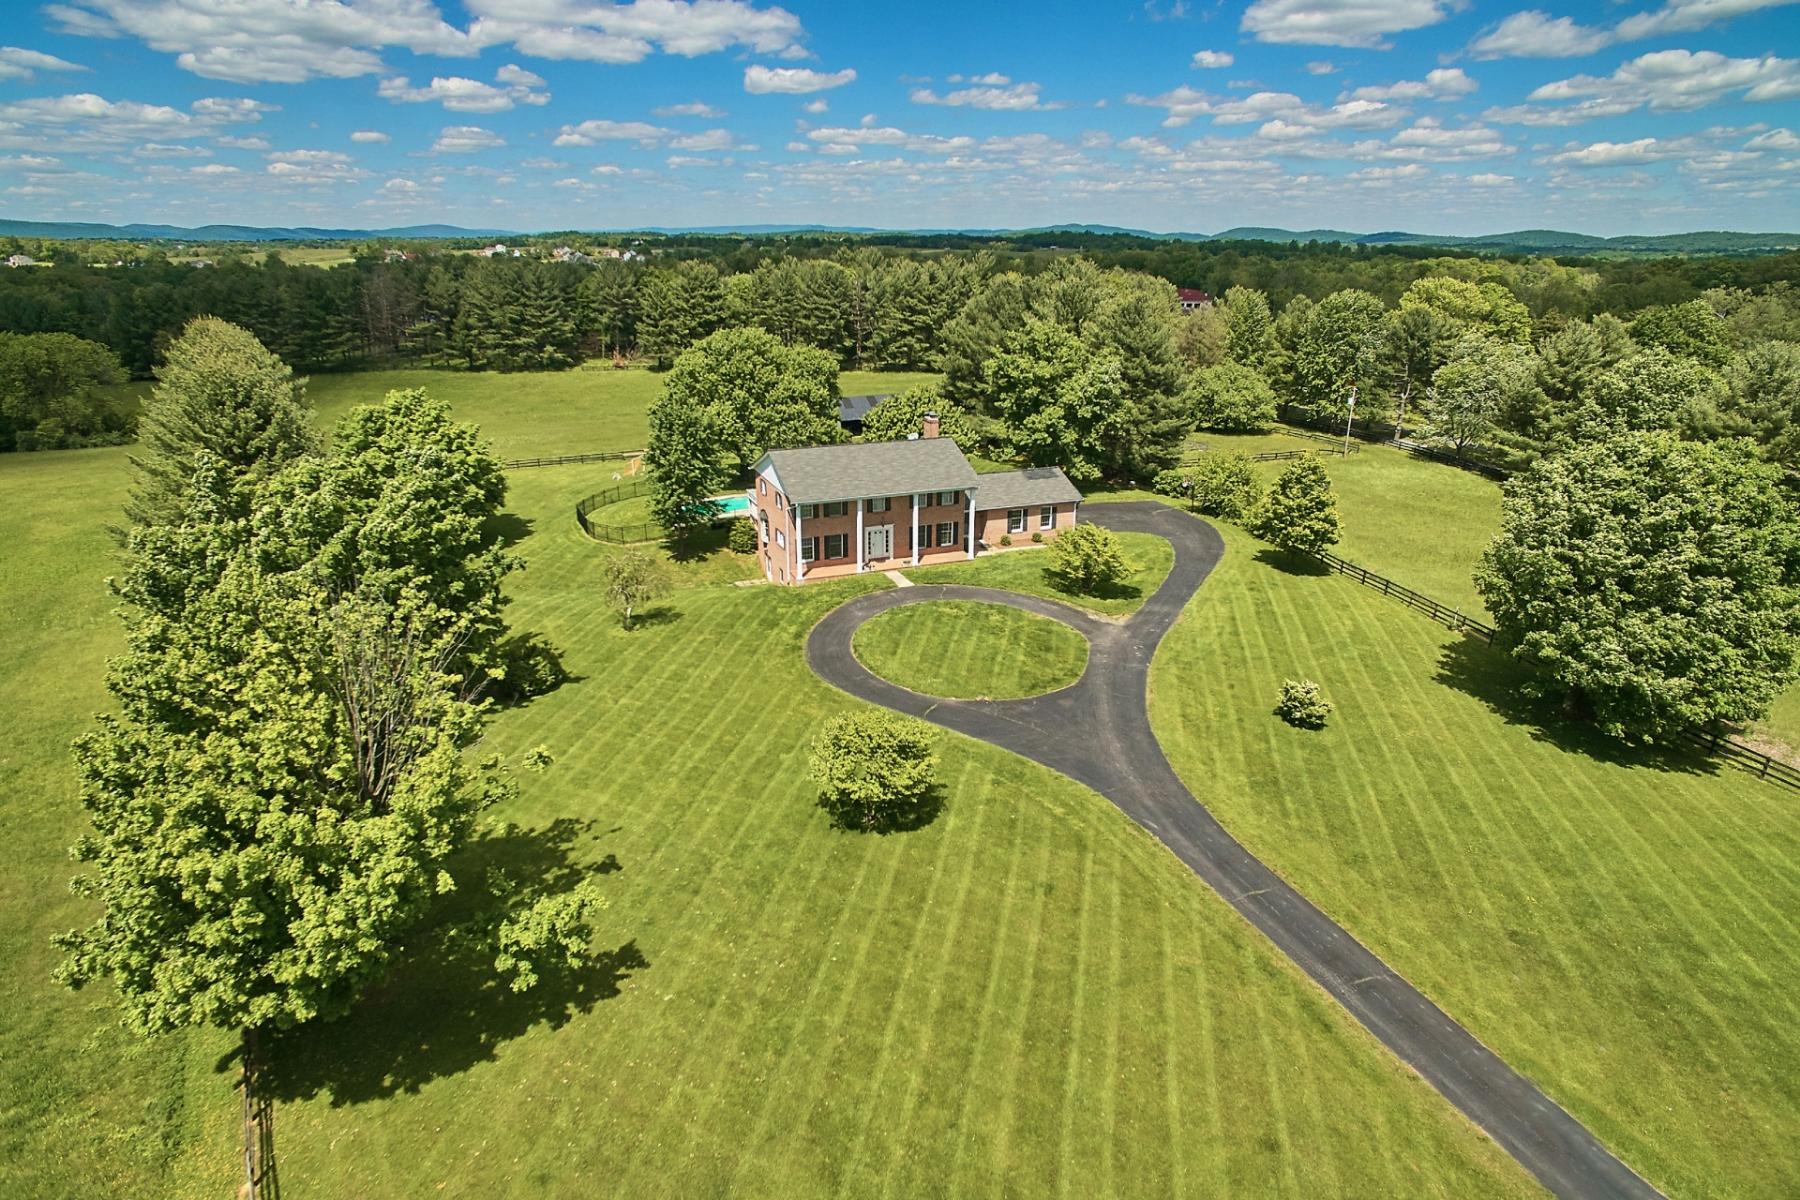 独户住宅 为 销售 在 OLD WHEATLAND ROAD 38798 Old Wheatland Road 沃特福德, 弗吉尼亚州, 20197 美国